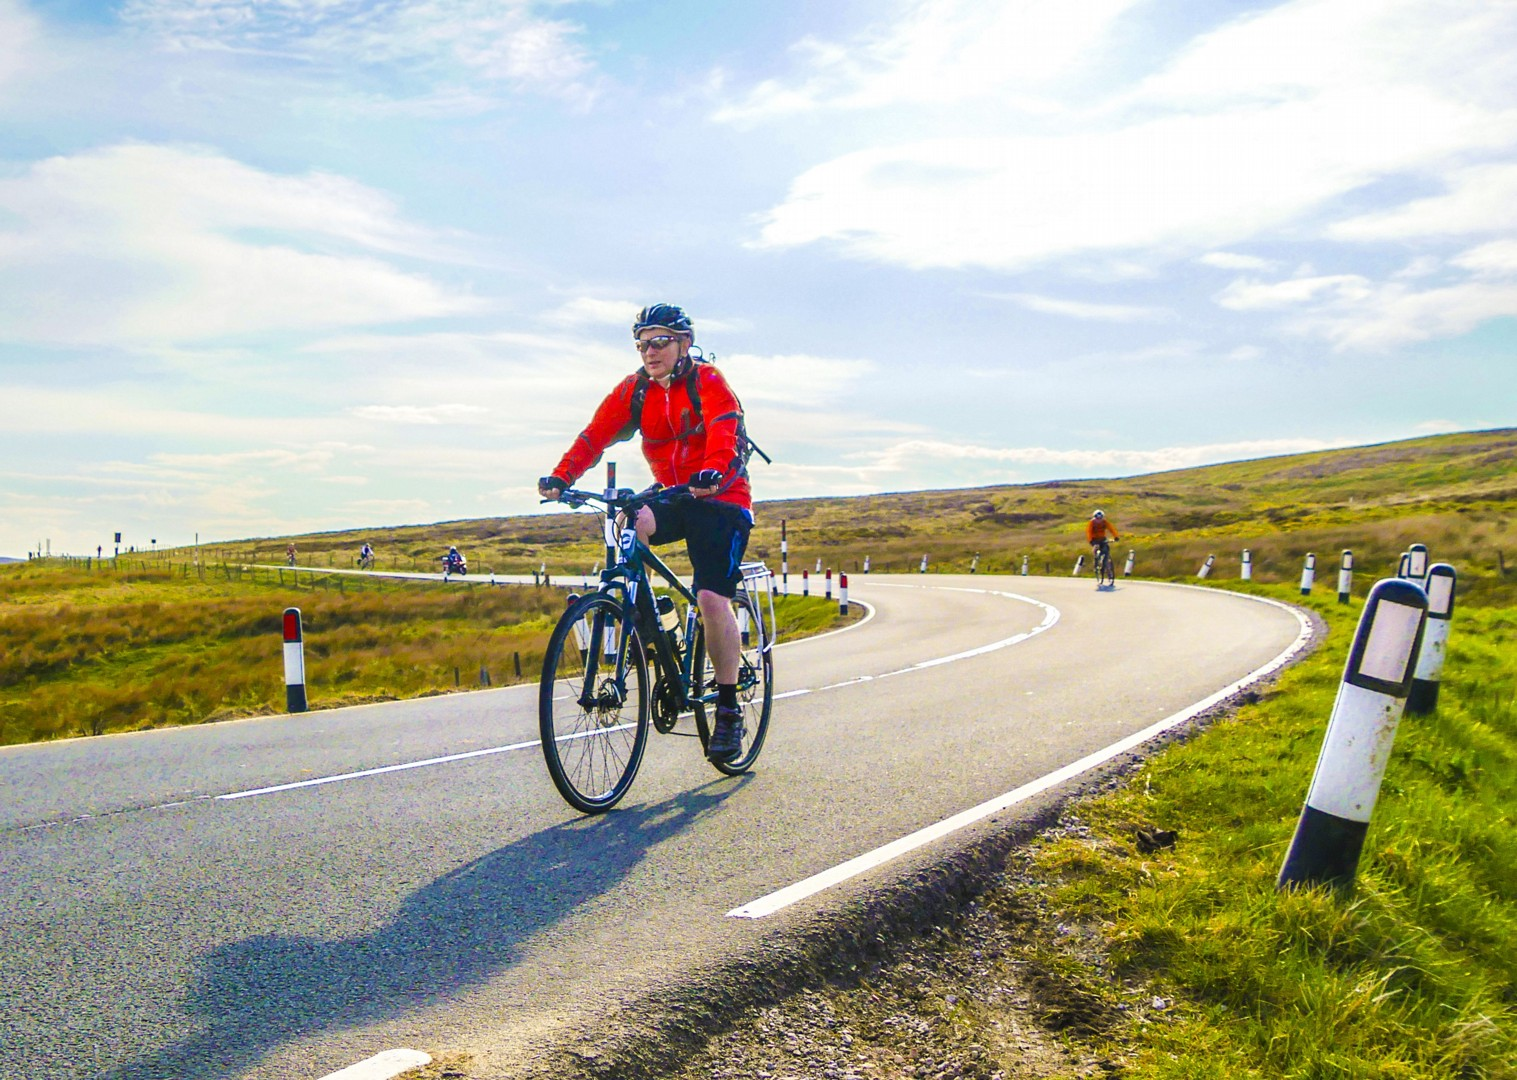 uk-cycle-fun-sunny-group-holiday-self-guided-easy-organised.jpg - UK - C2C - Coast to Coast 4 Days Cycling - Self-Guided Leisure Cycling Holiday - Leisure Cycling